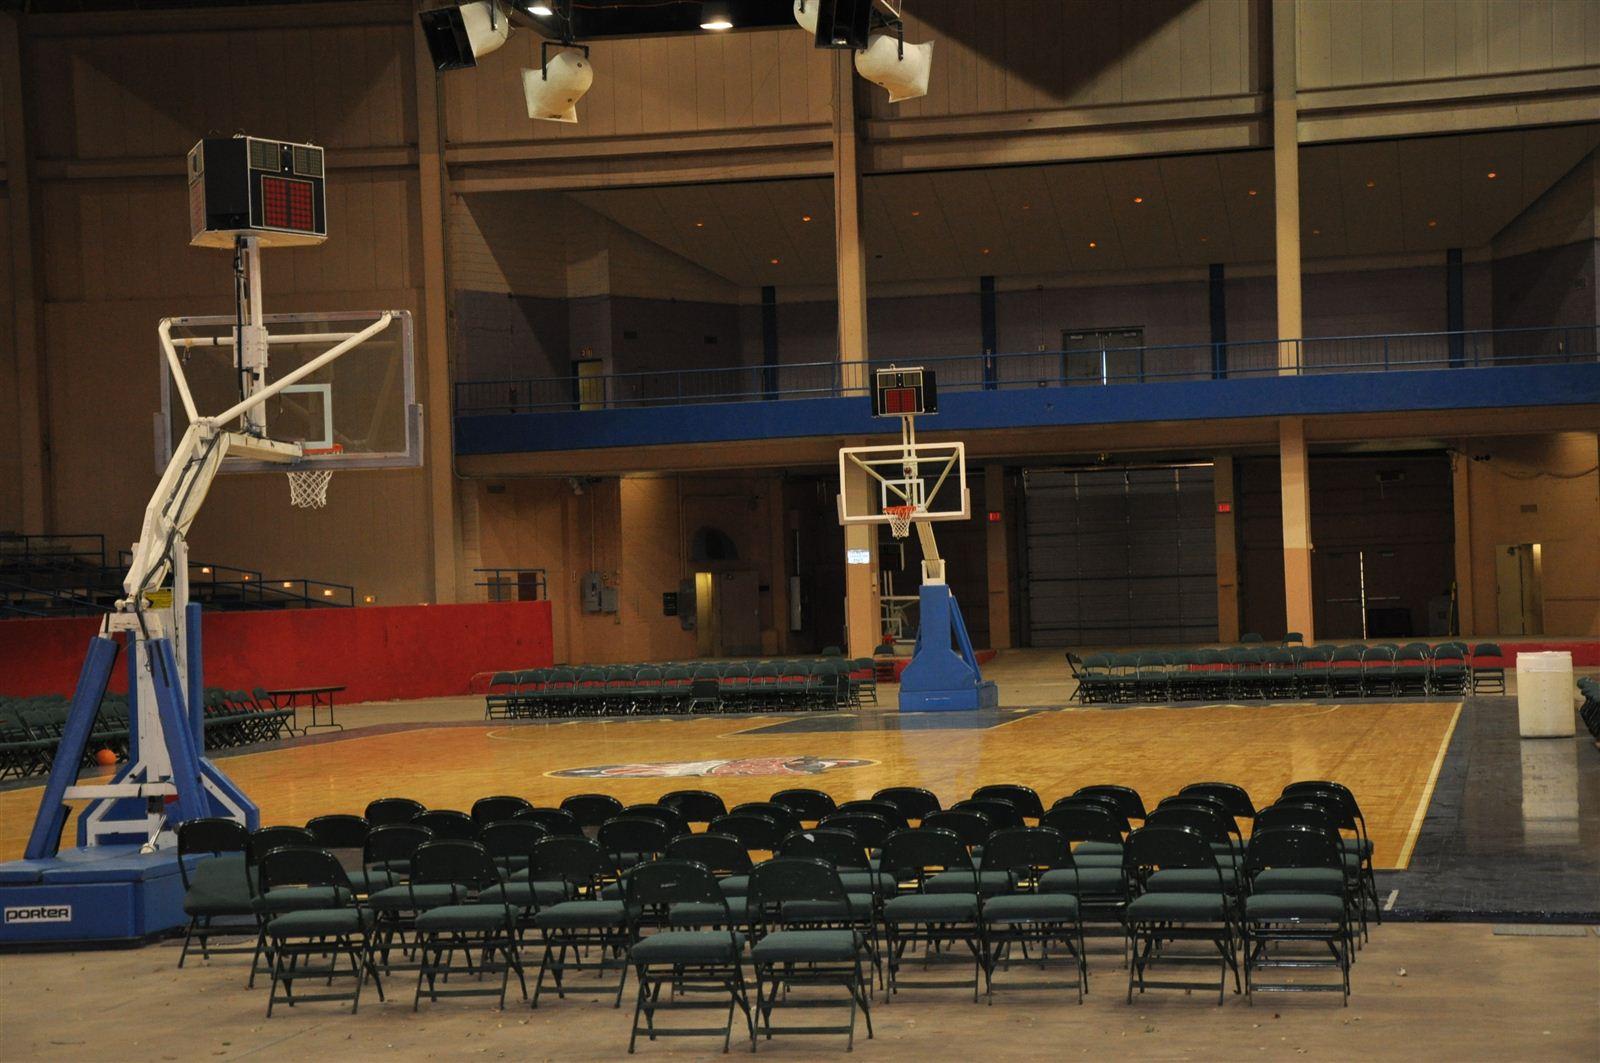 Location Photos Of Fair Park Coliseum